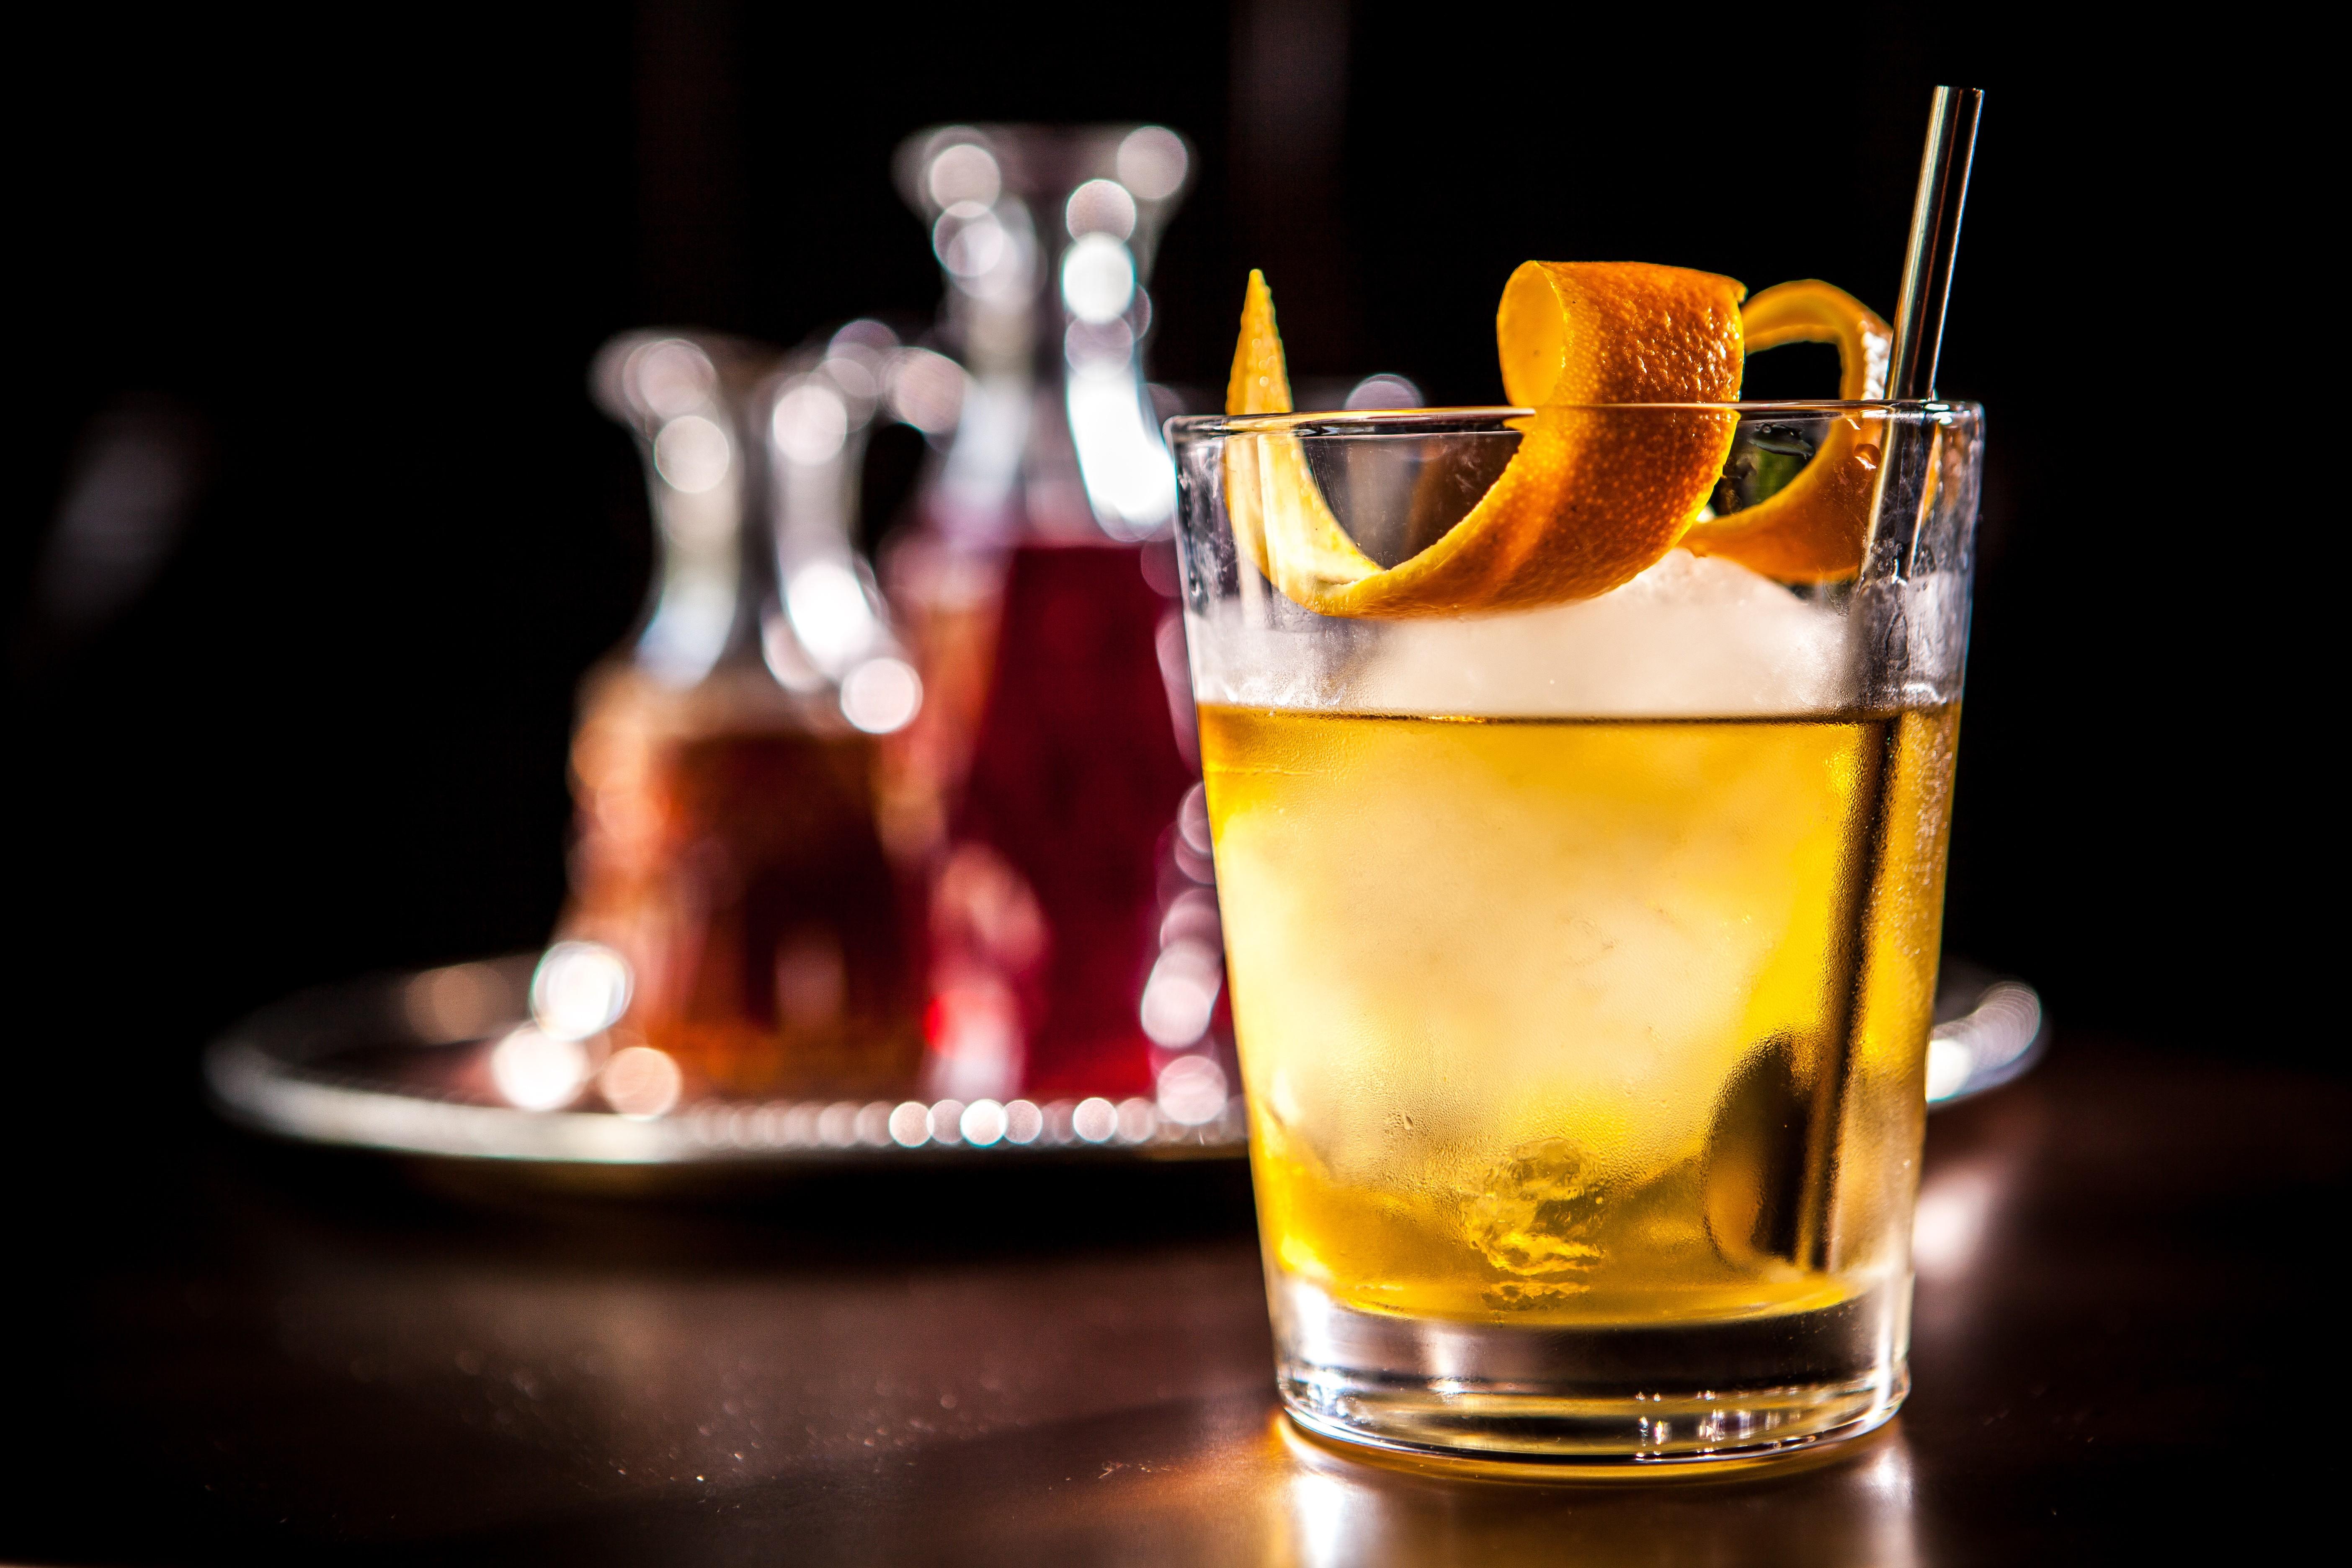 Wallpaper Cocktails Whiskey Ice Orange Food 788